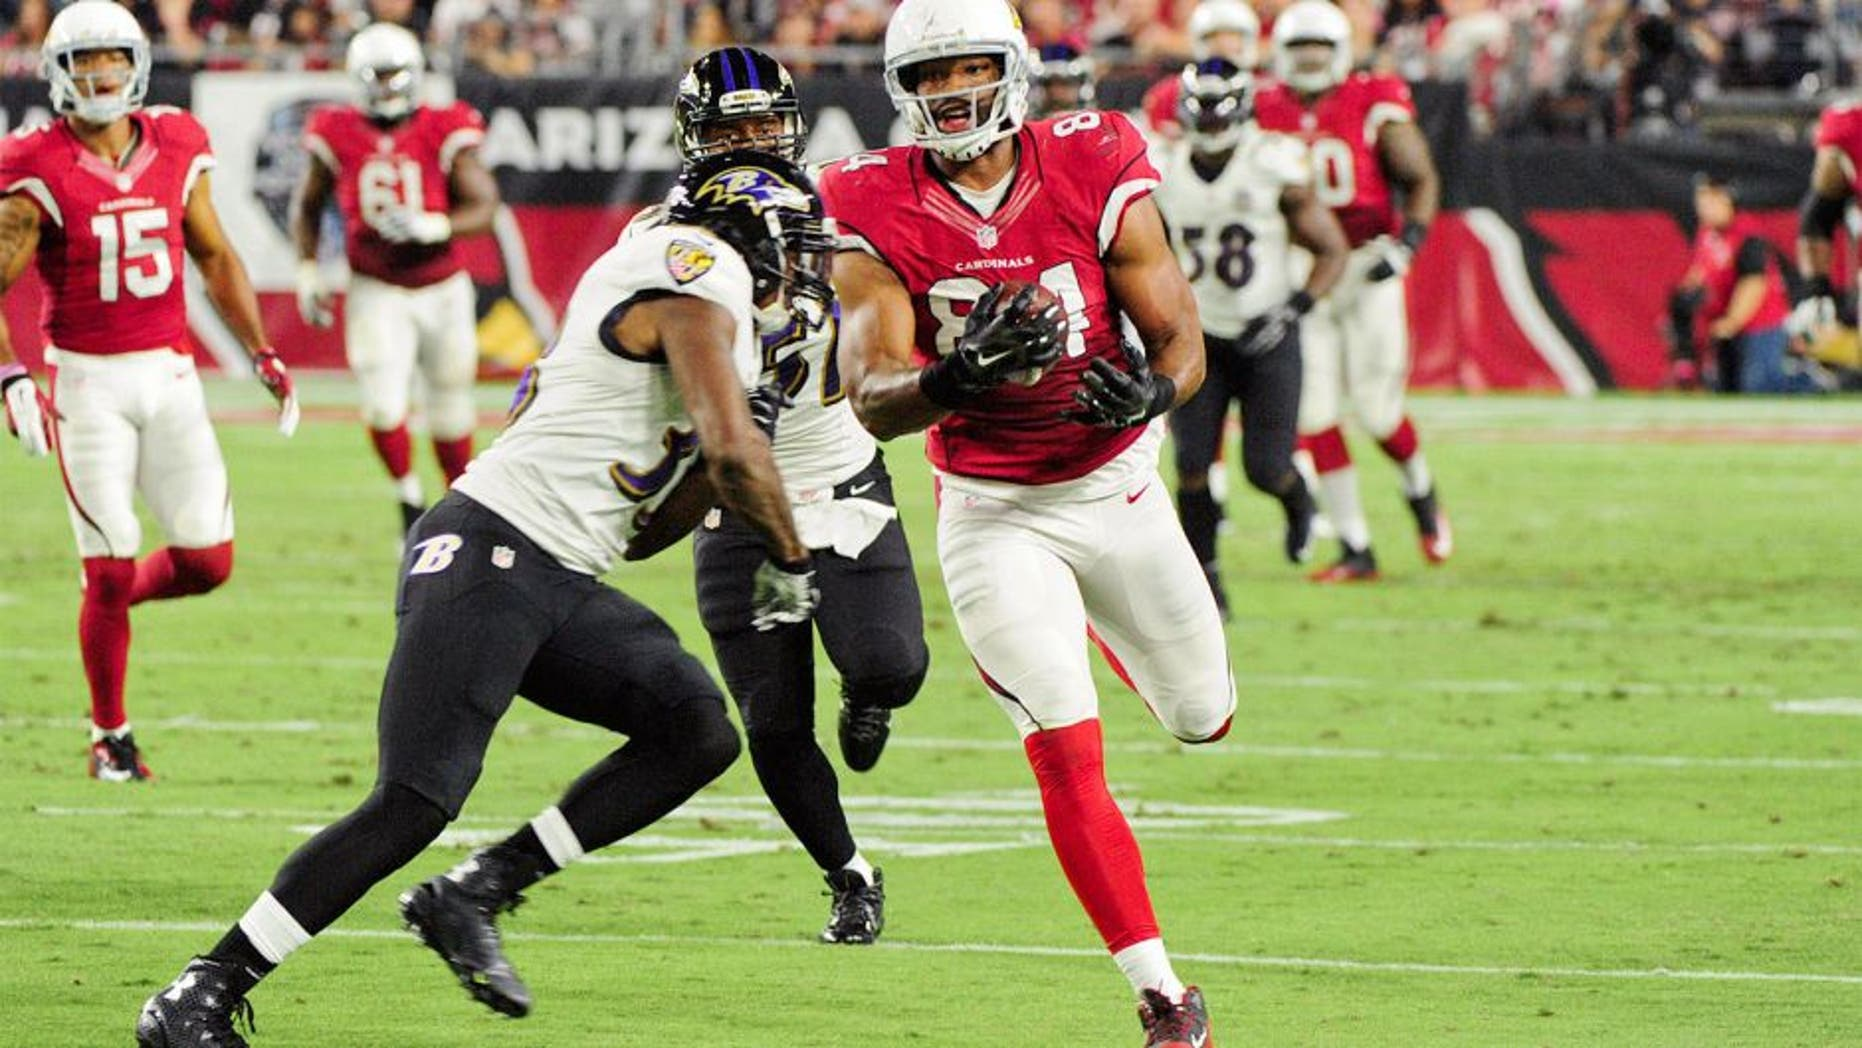 Oct 26, 2015; Glendale, AZ, USA; Baltimore Ravens strong safety Will Hill (33) hits Arizona Cardinals tight end Jermaine Gresham (84) during the first half at University of Phoenix Stadium. Mandatory Credit: Matt Kartozian-USA TODAY Sports